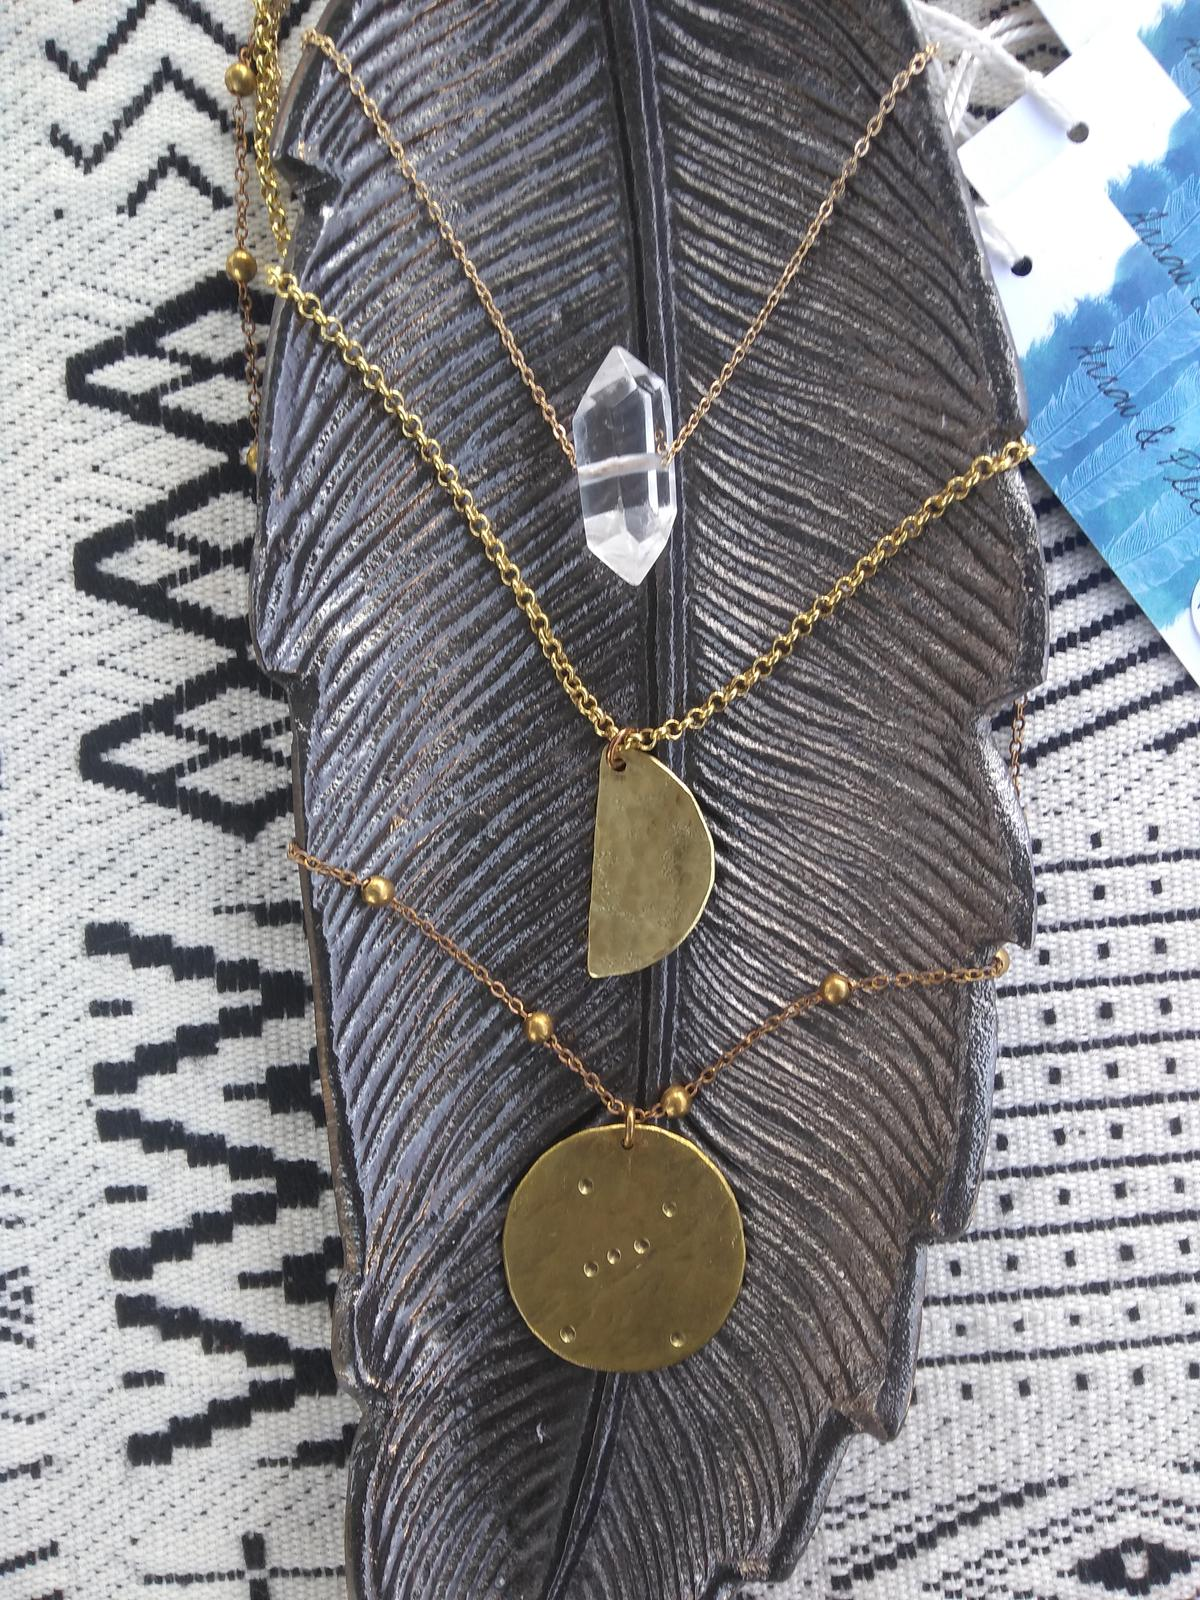 Layering necklaces & visual set up